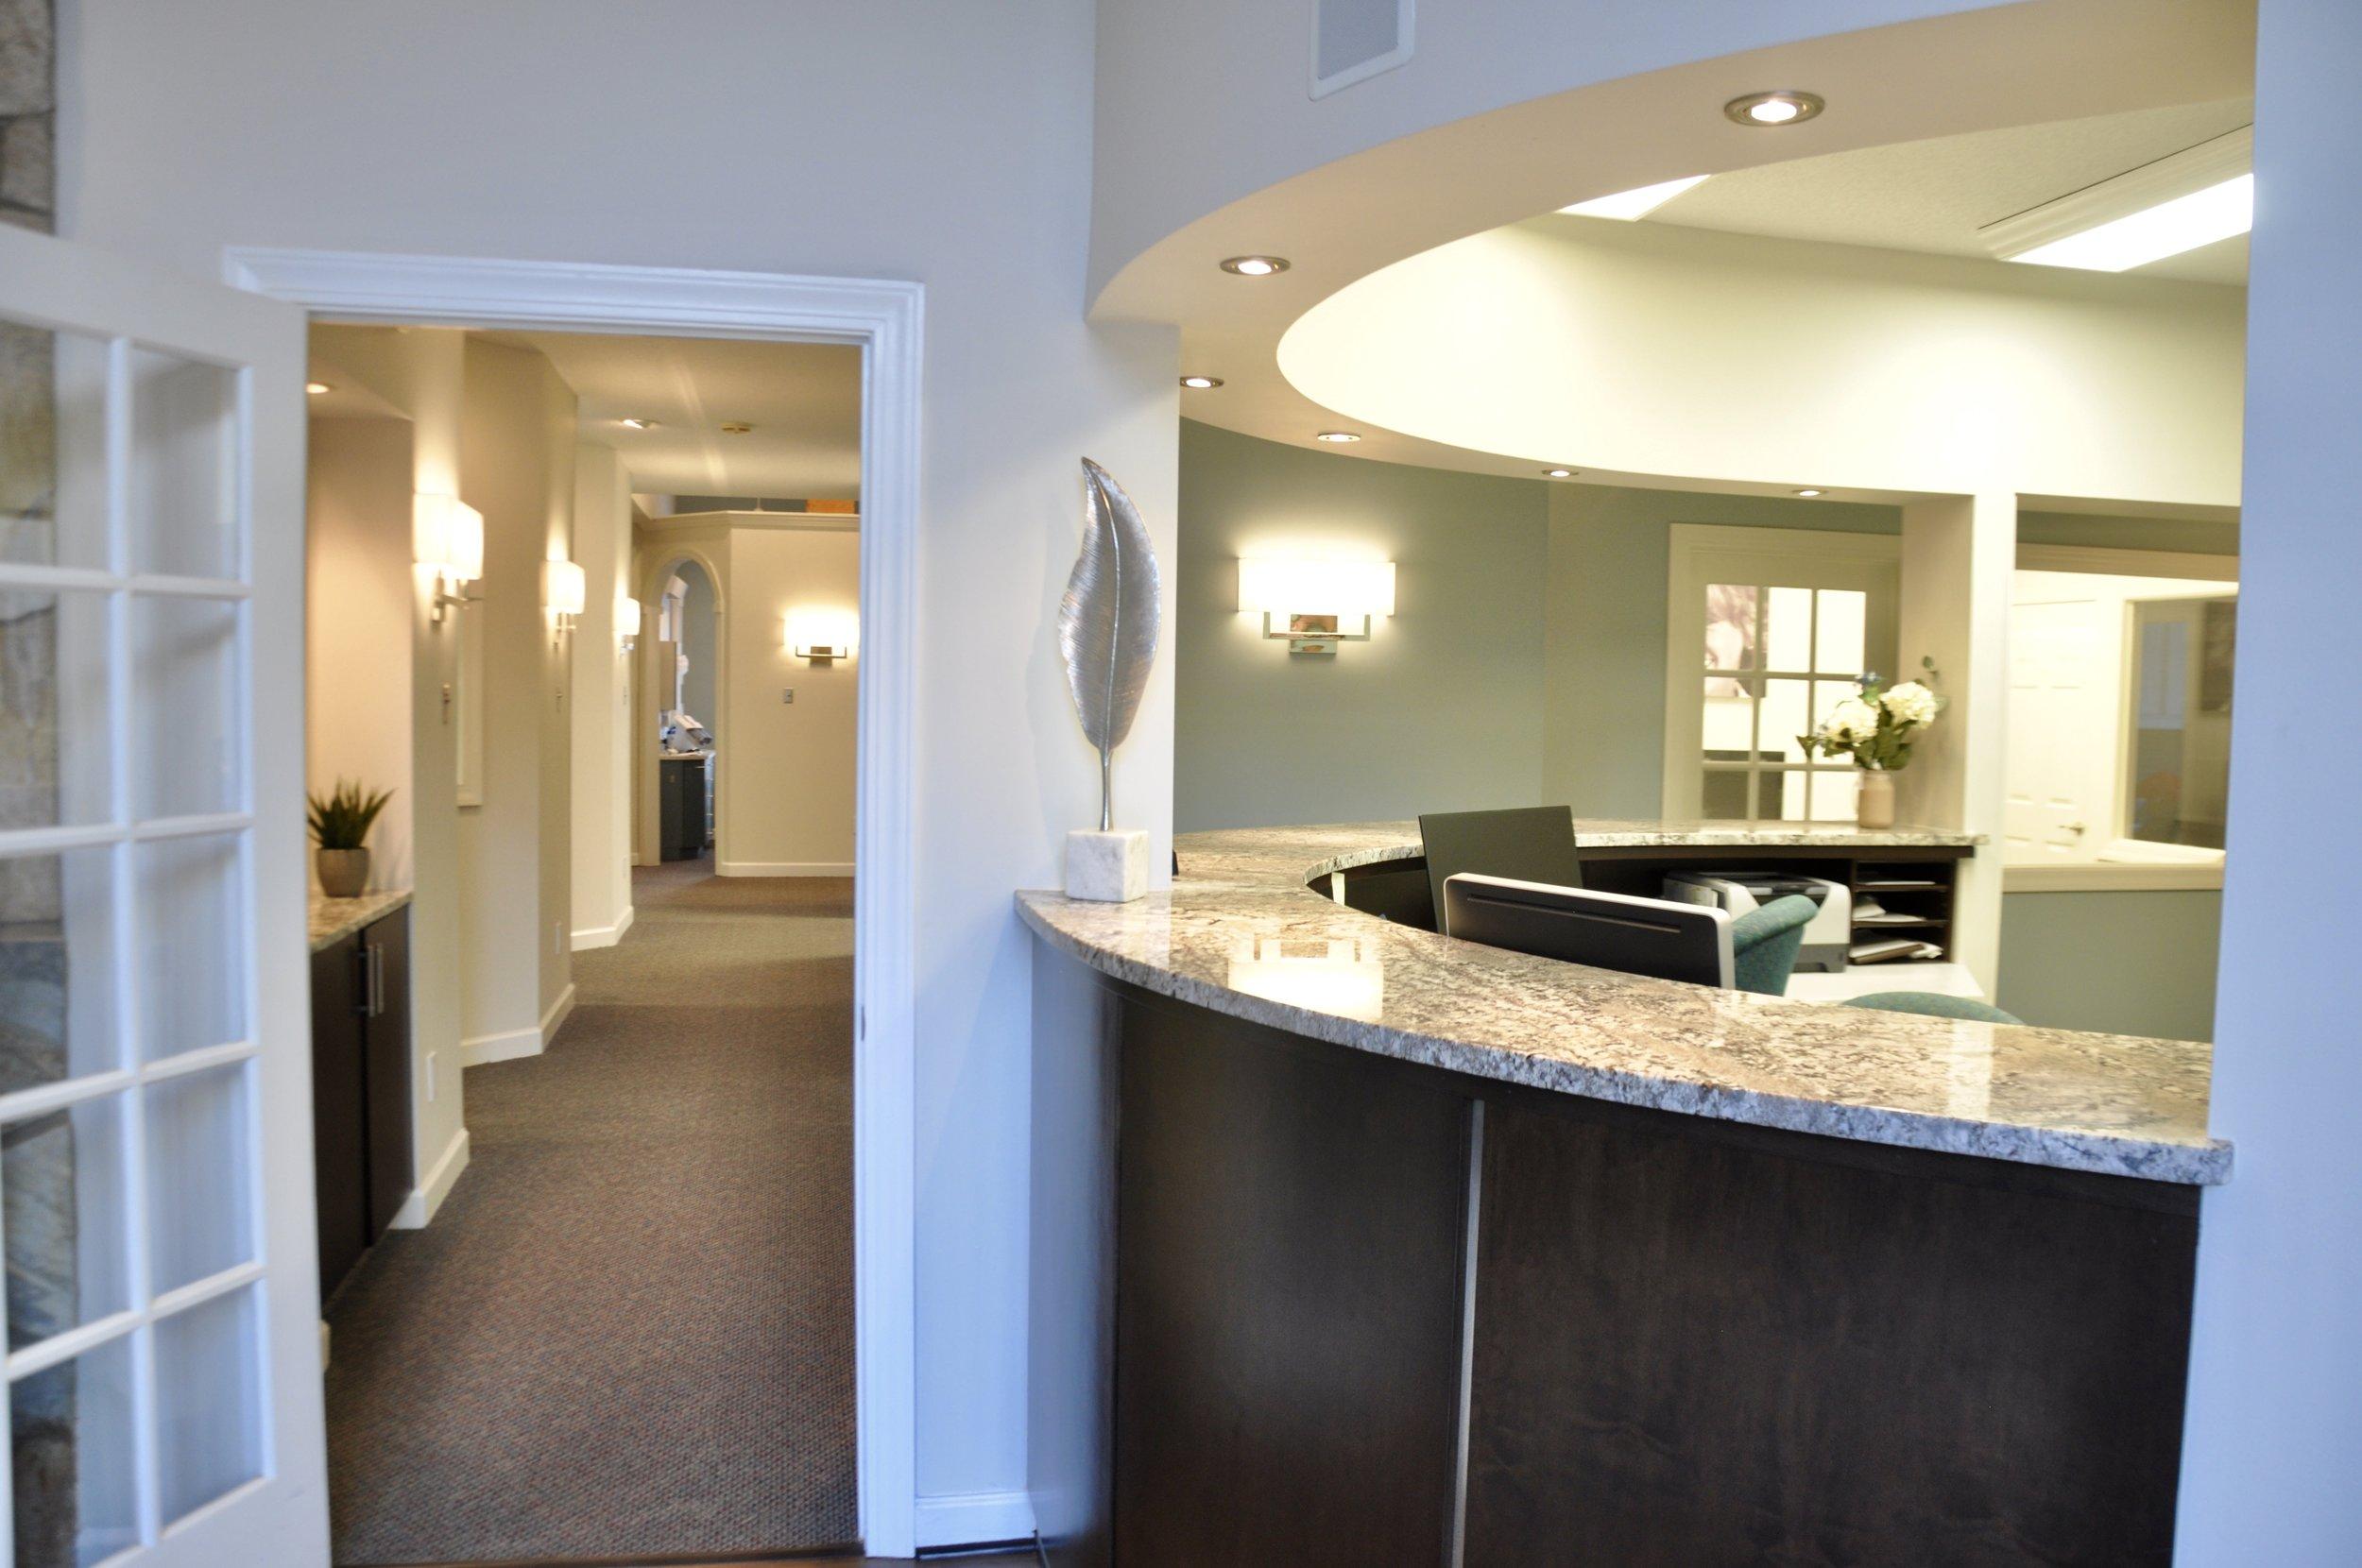 Best dentist office, Lexington, SC and Columbia, SC